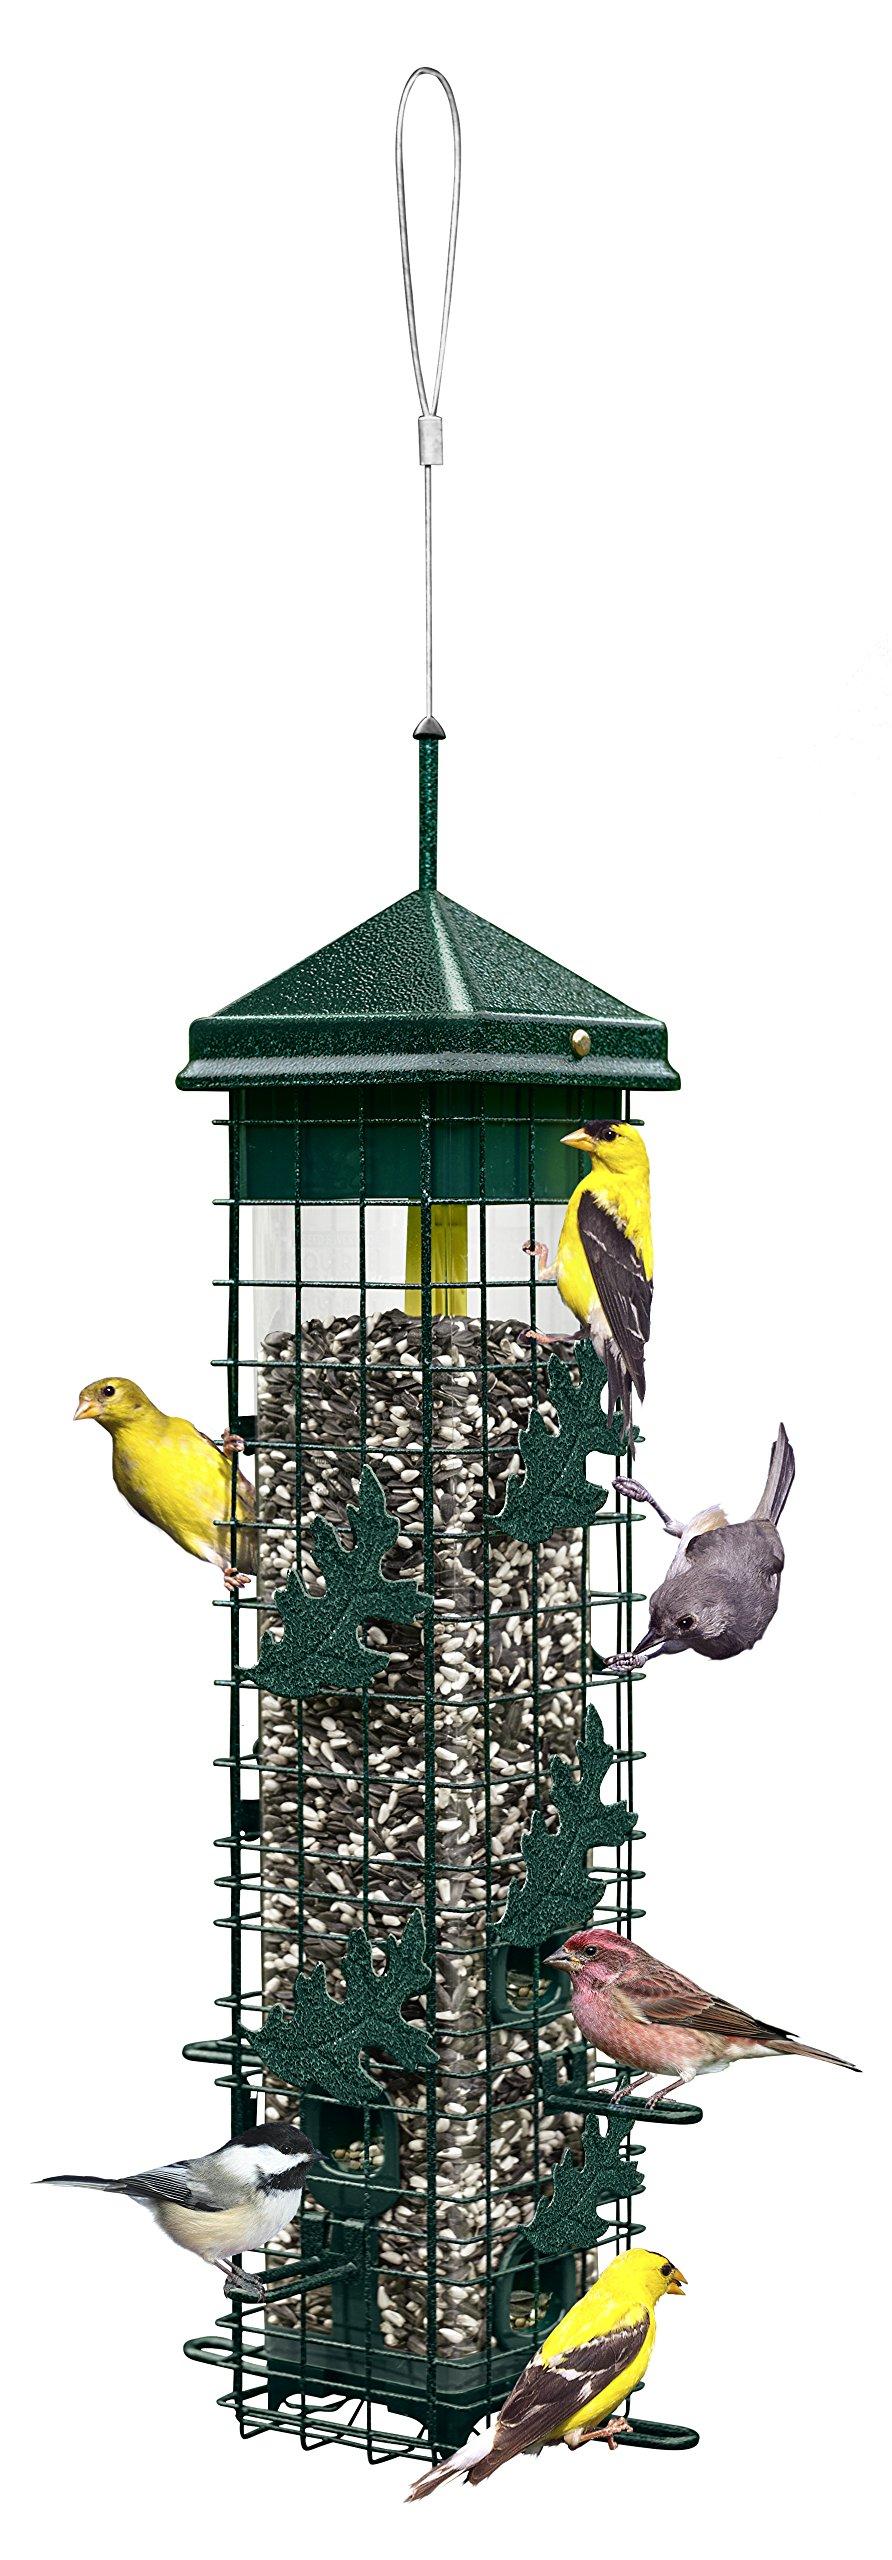 Squirrel Solution200 5.5''x5.5''x30'' (w/hanger) Wild Bird Feeder with 6 Feeding Ports, 3.4lb Seed Capacity, Free Seed Funnel